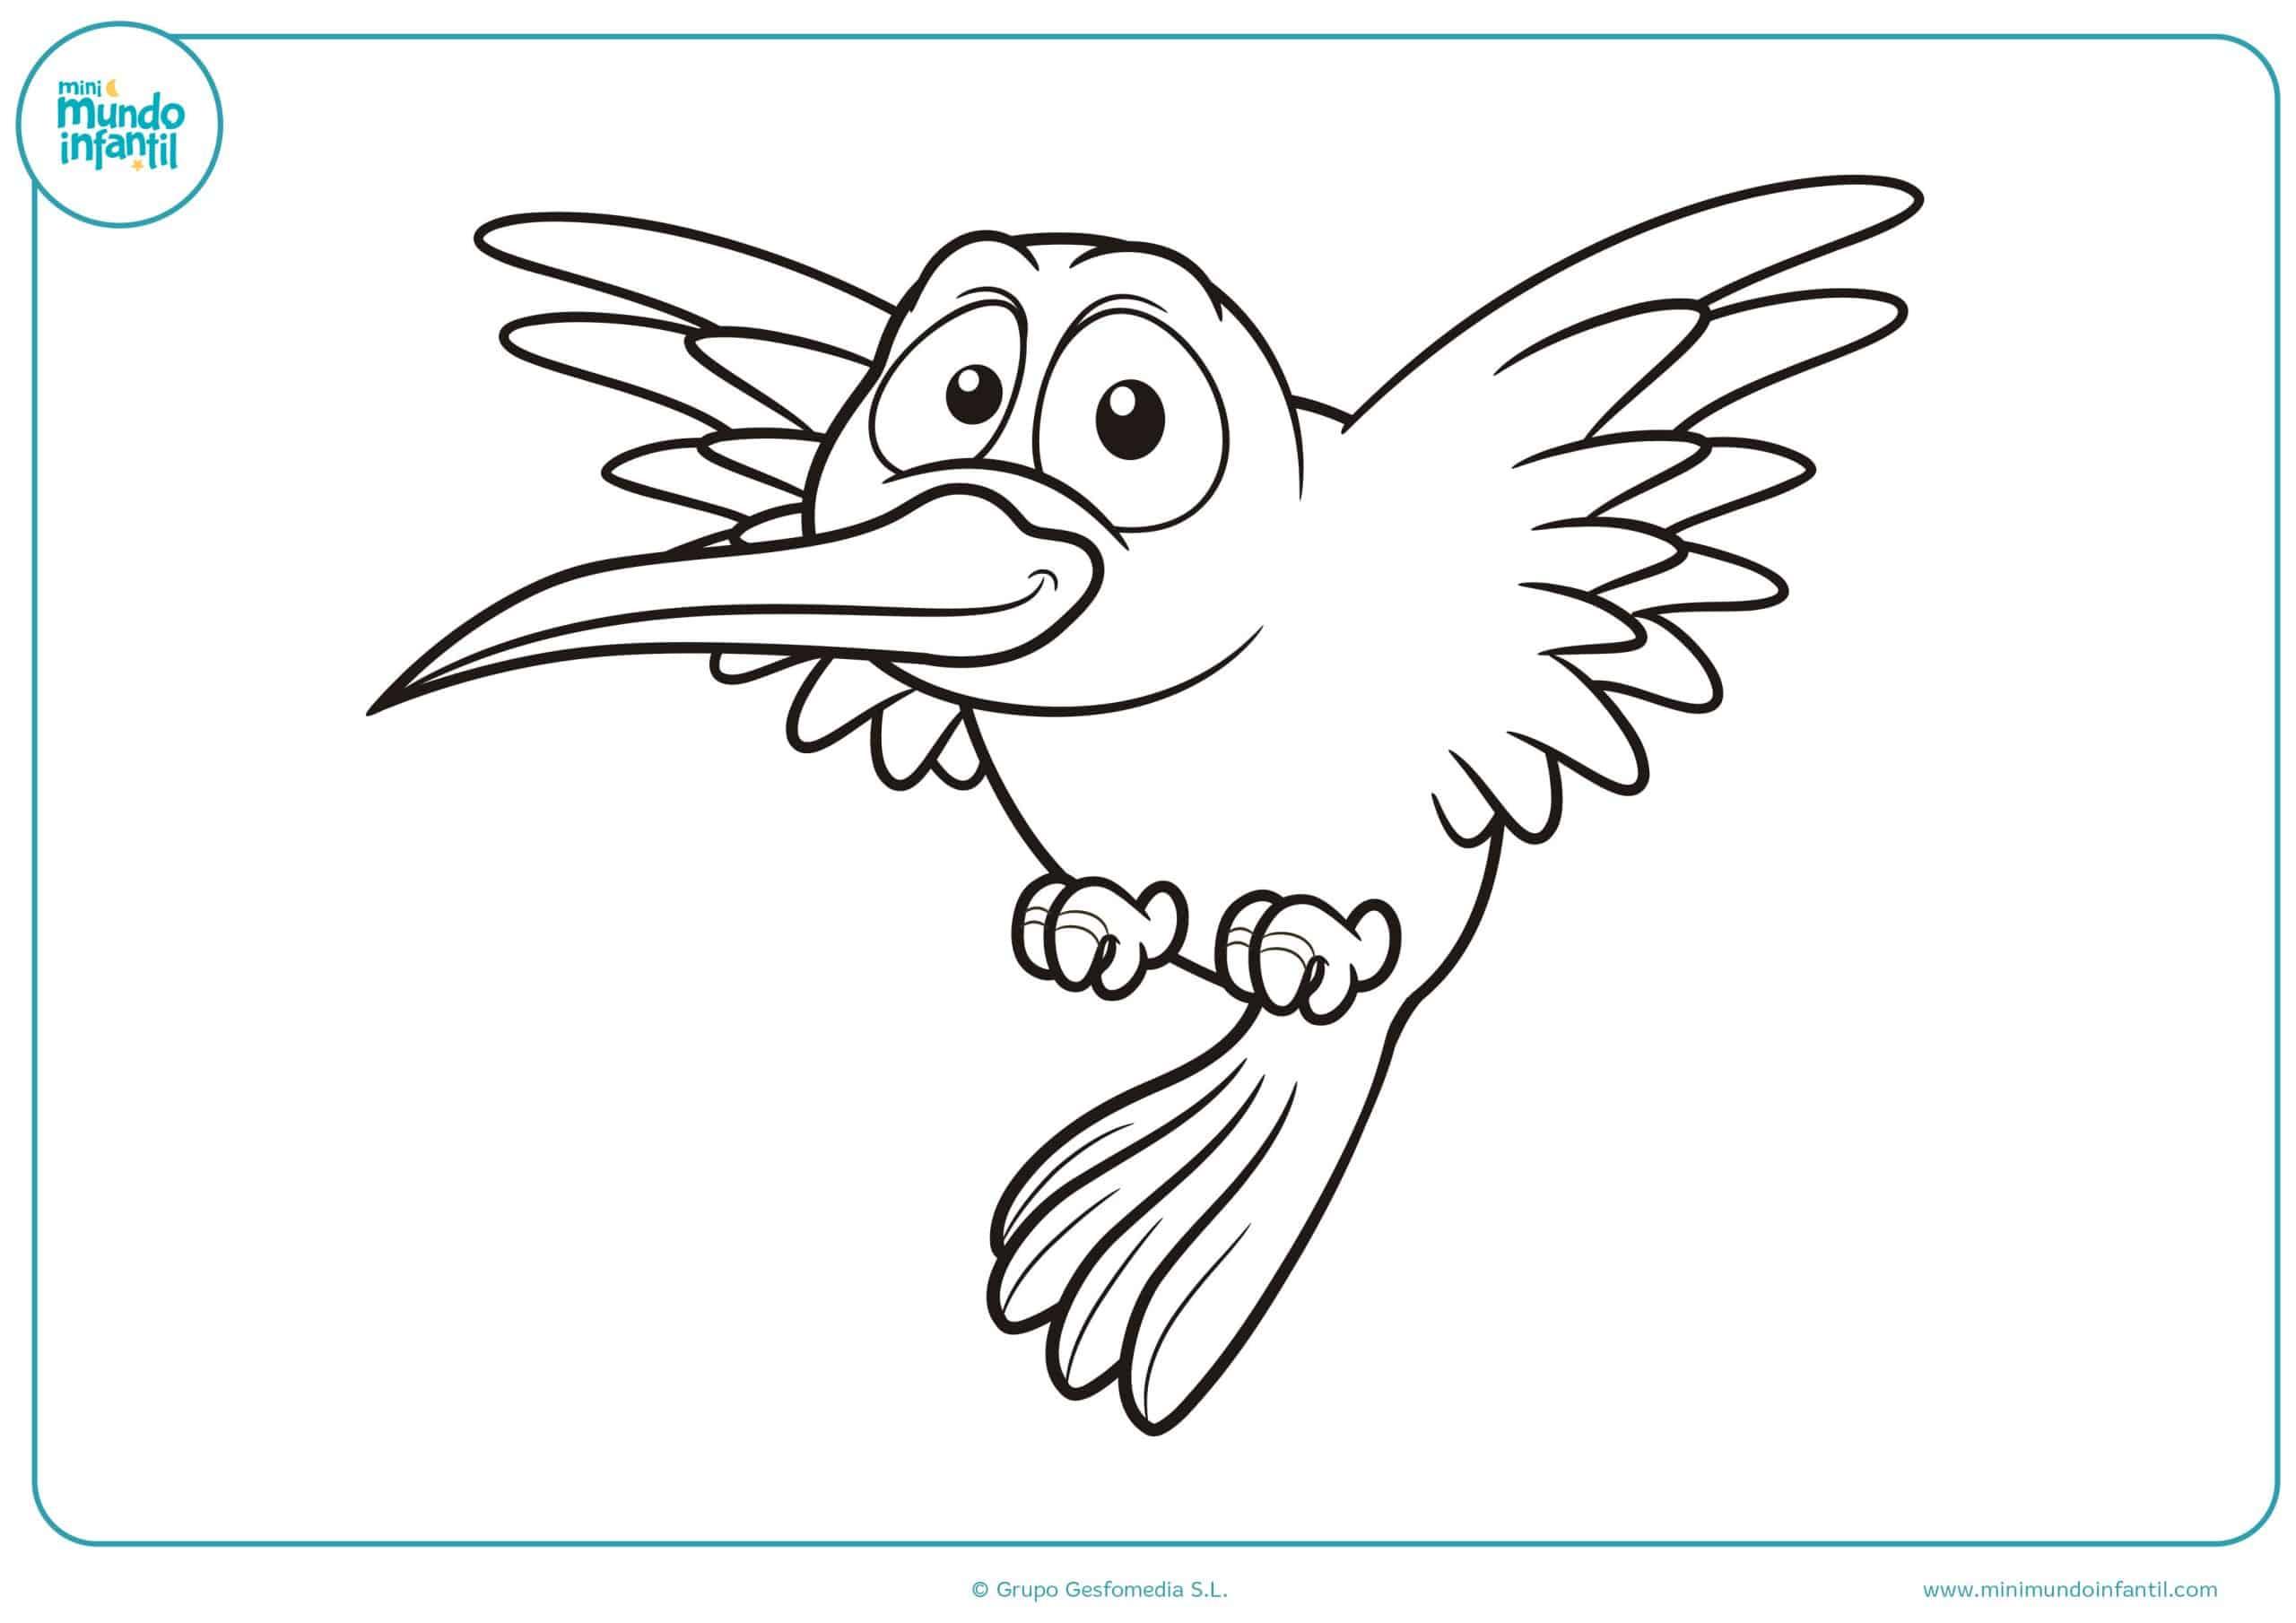 Dibujos aves colorear para imprimir